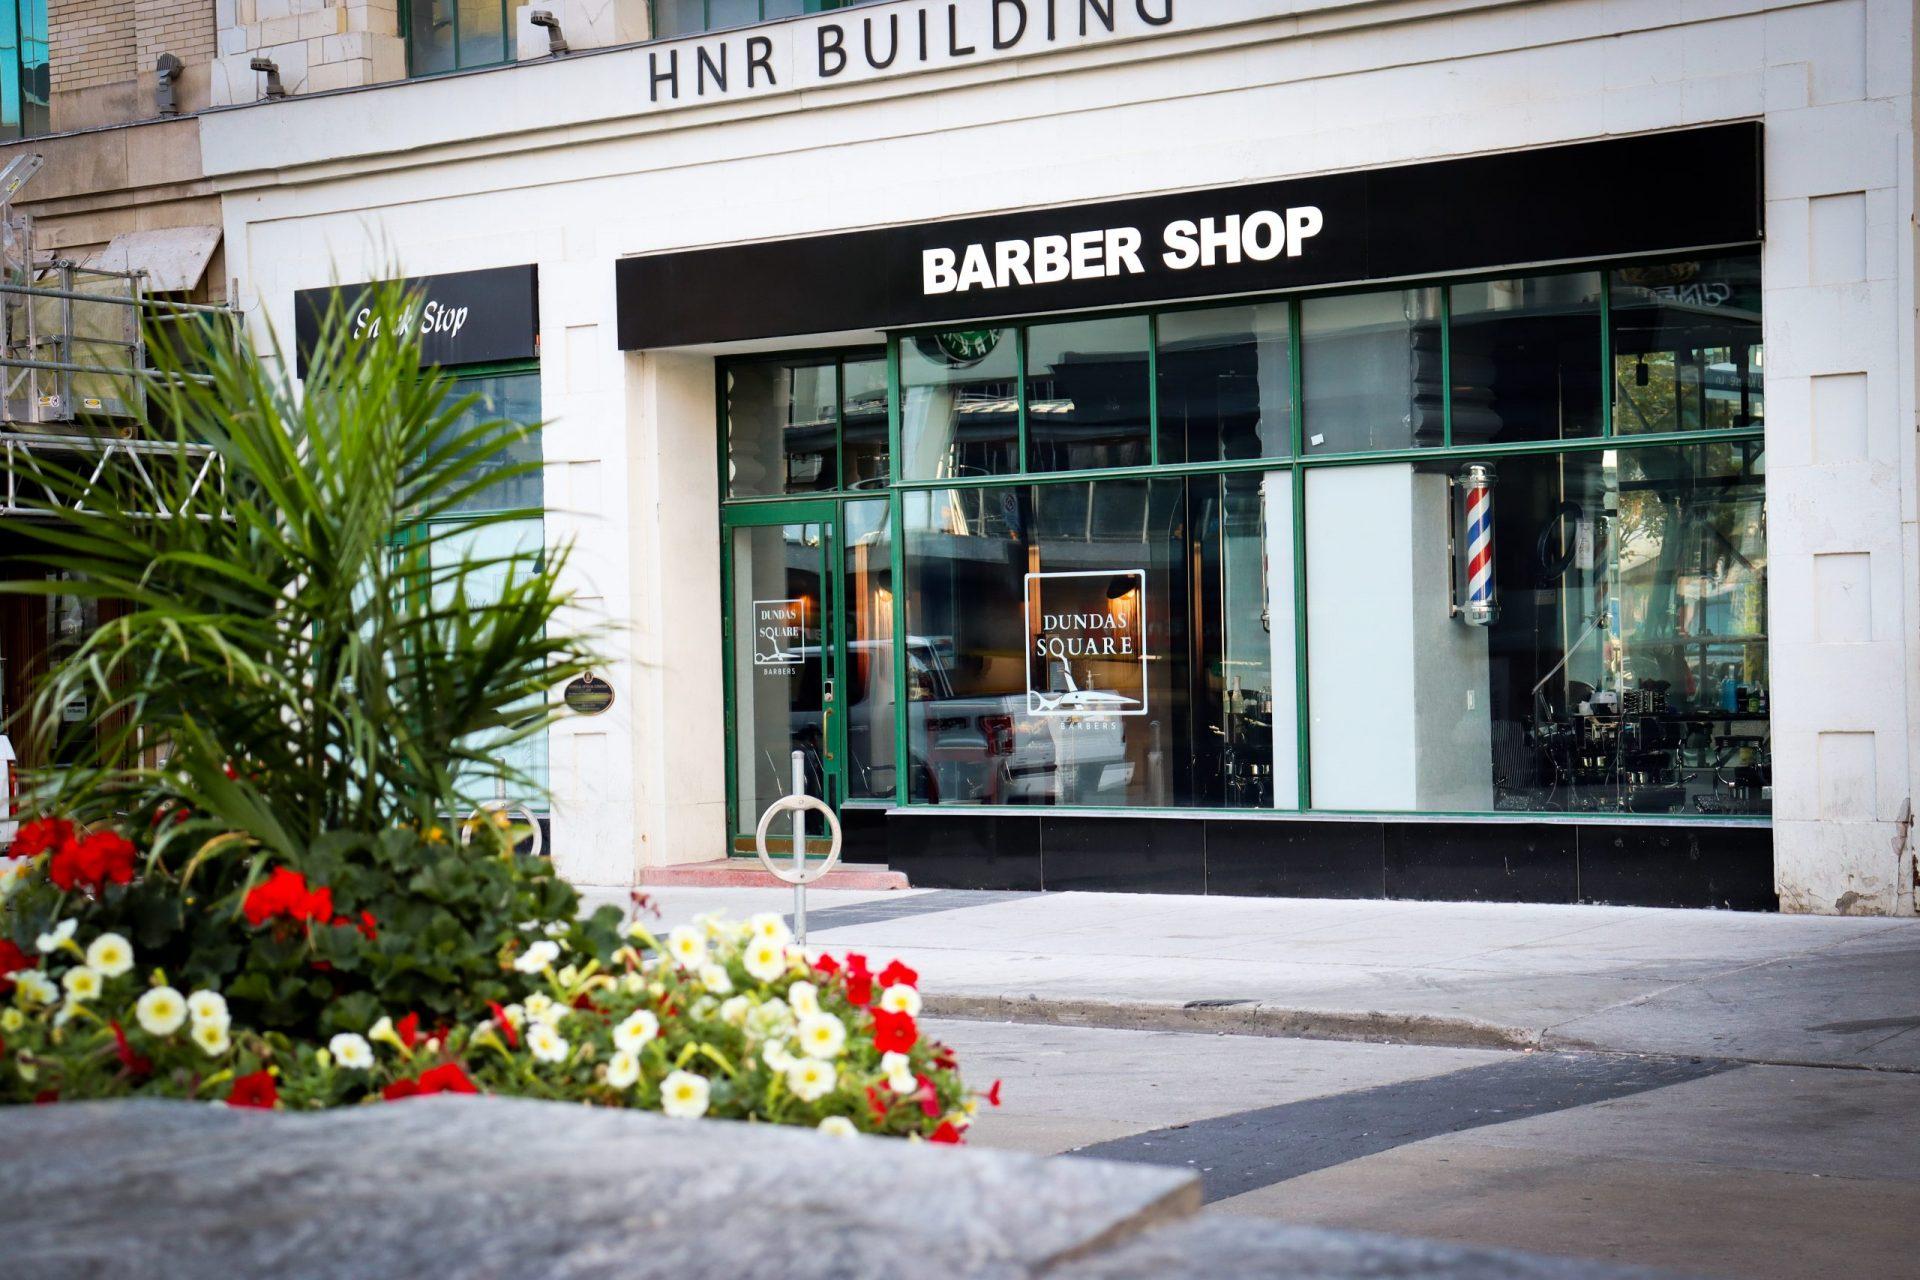 Dundas Square Barbers Storefront Photo